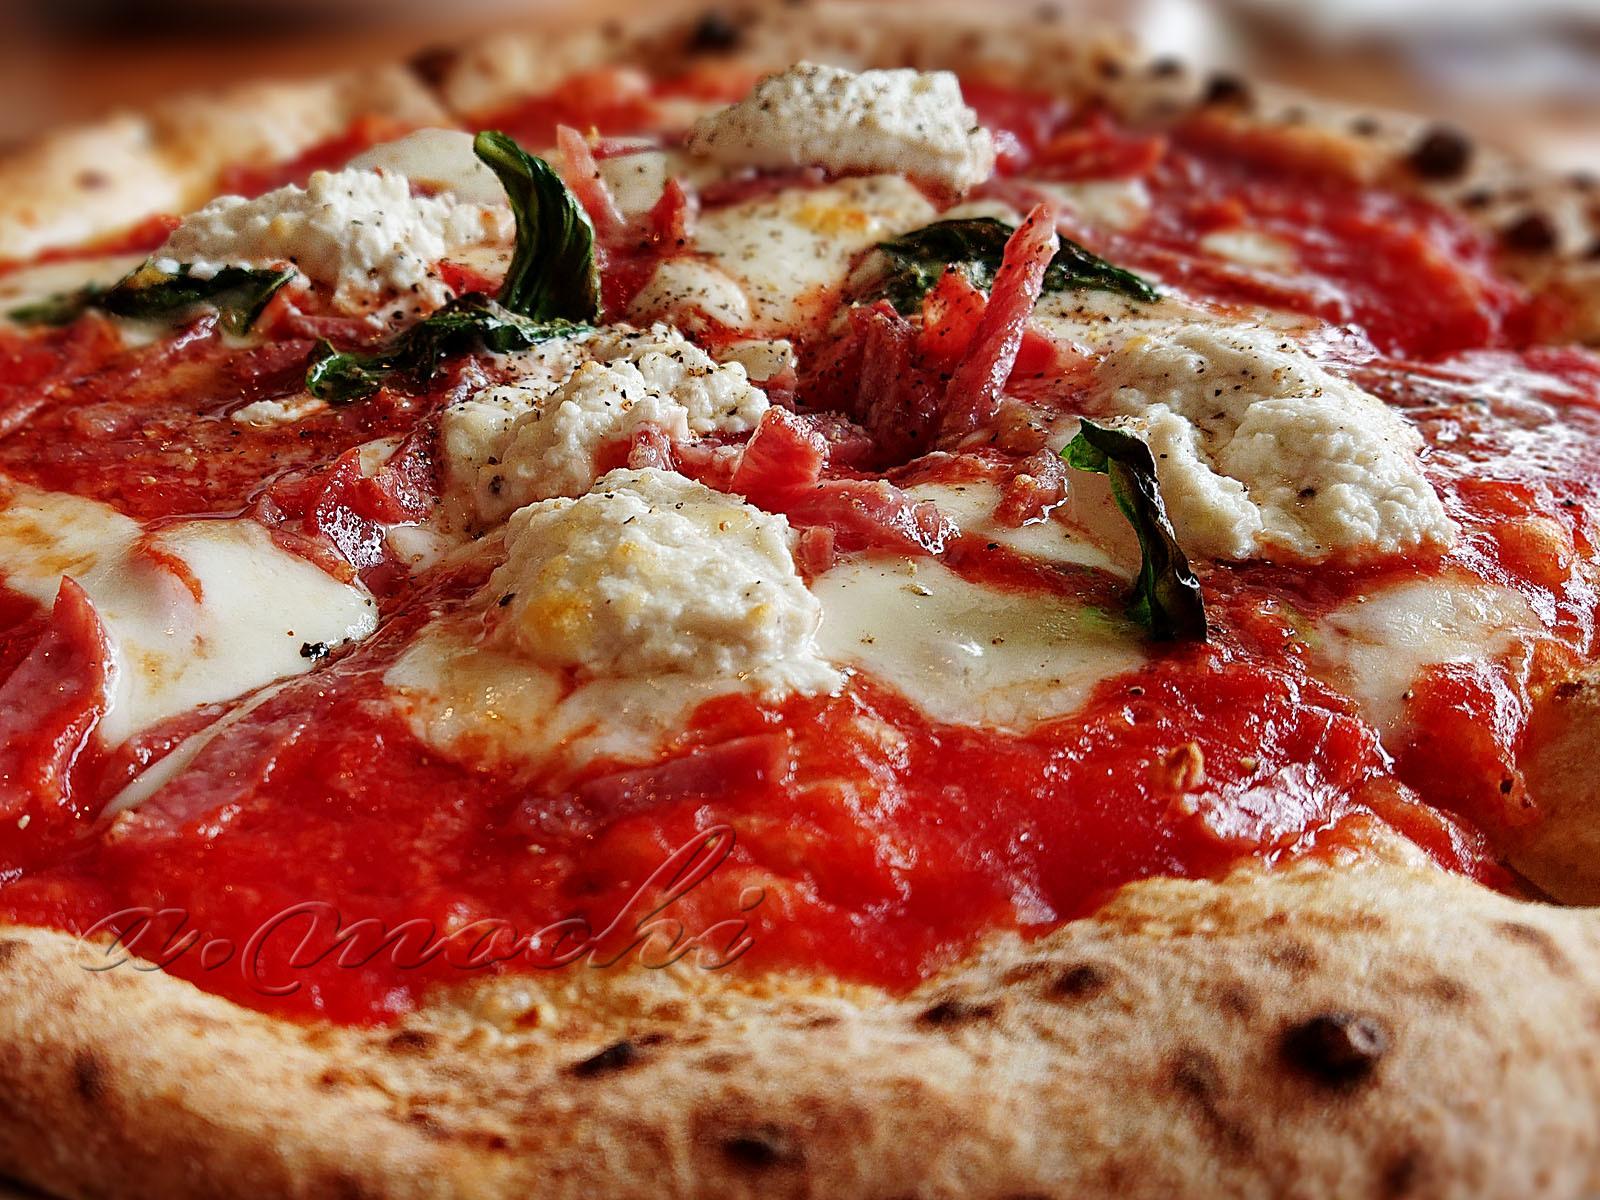 lafortuna2_pizza.jpg